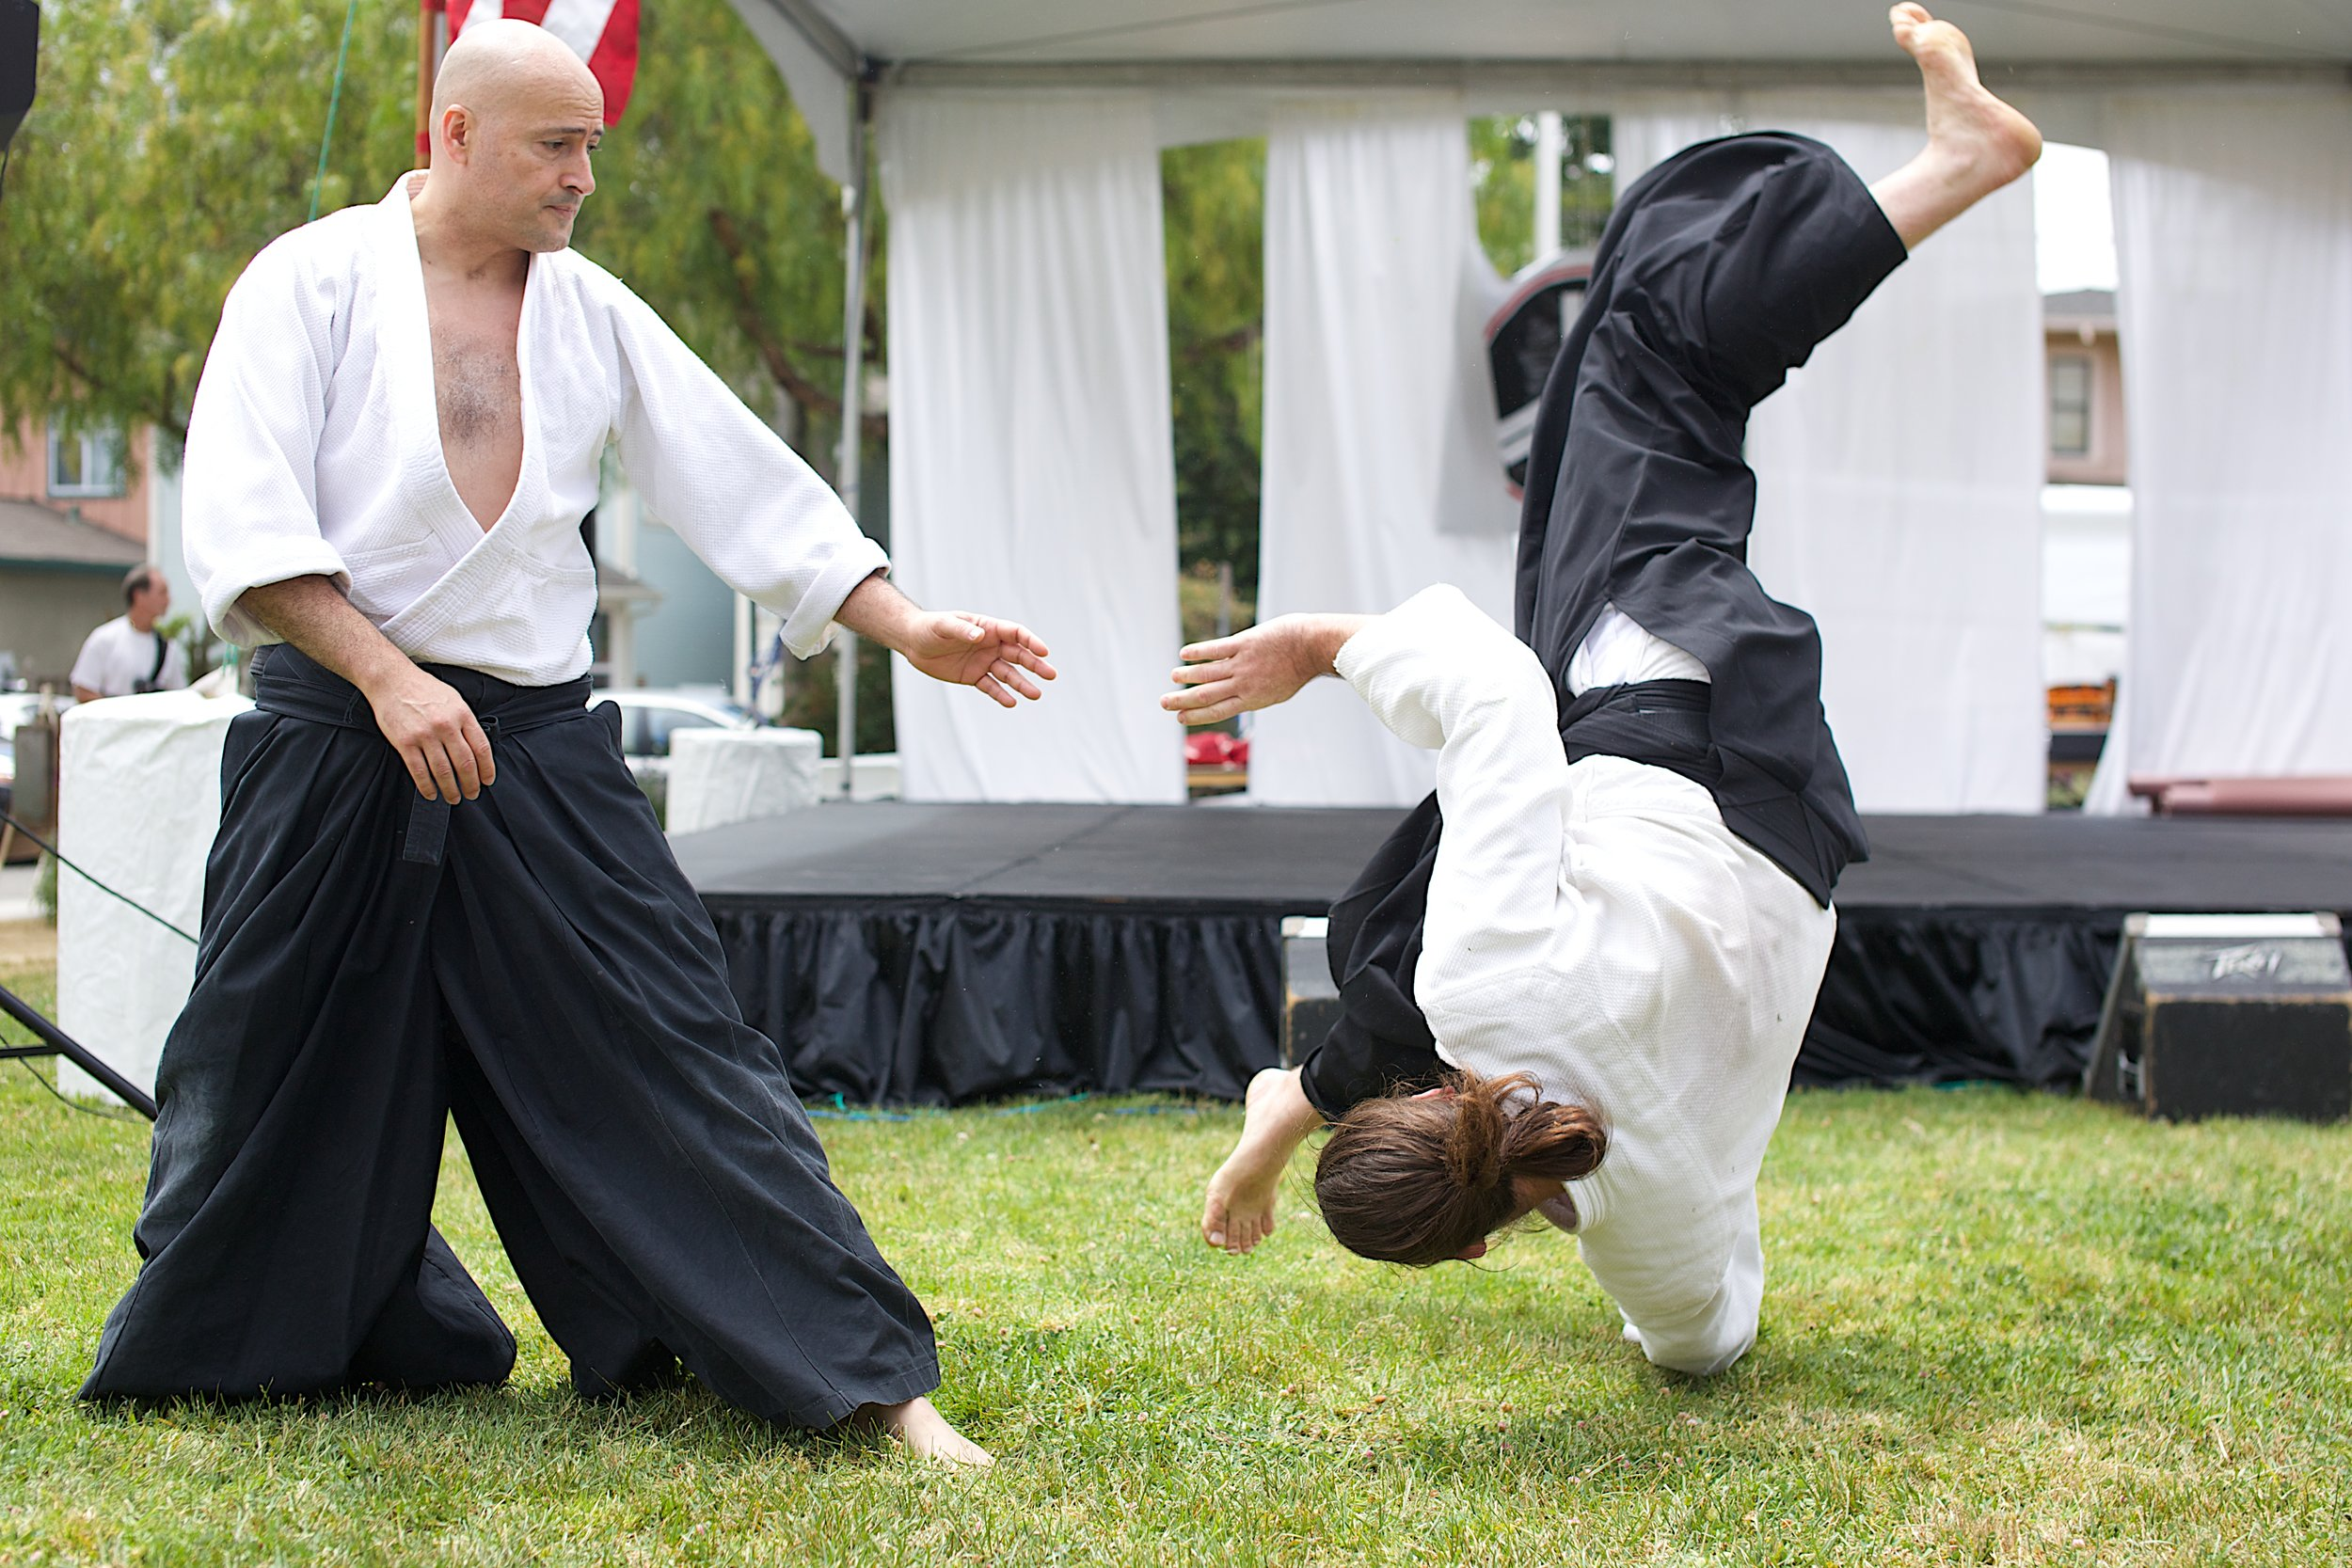 aikido-of-santa-cruz---japanese-cultural-fair-of-santa-cruz-2015_18975792663_o.jpg